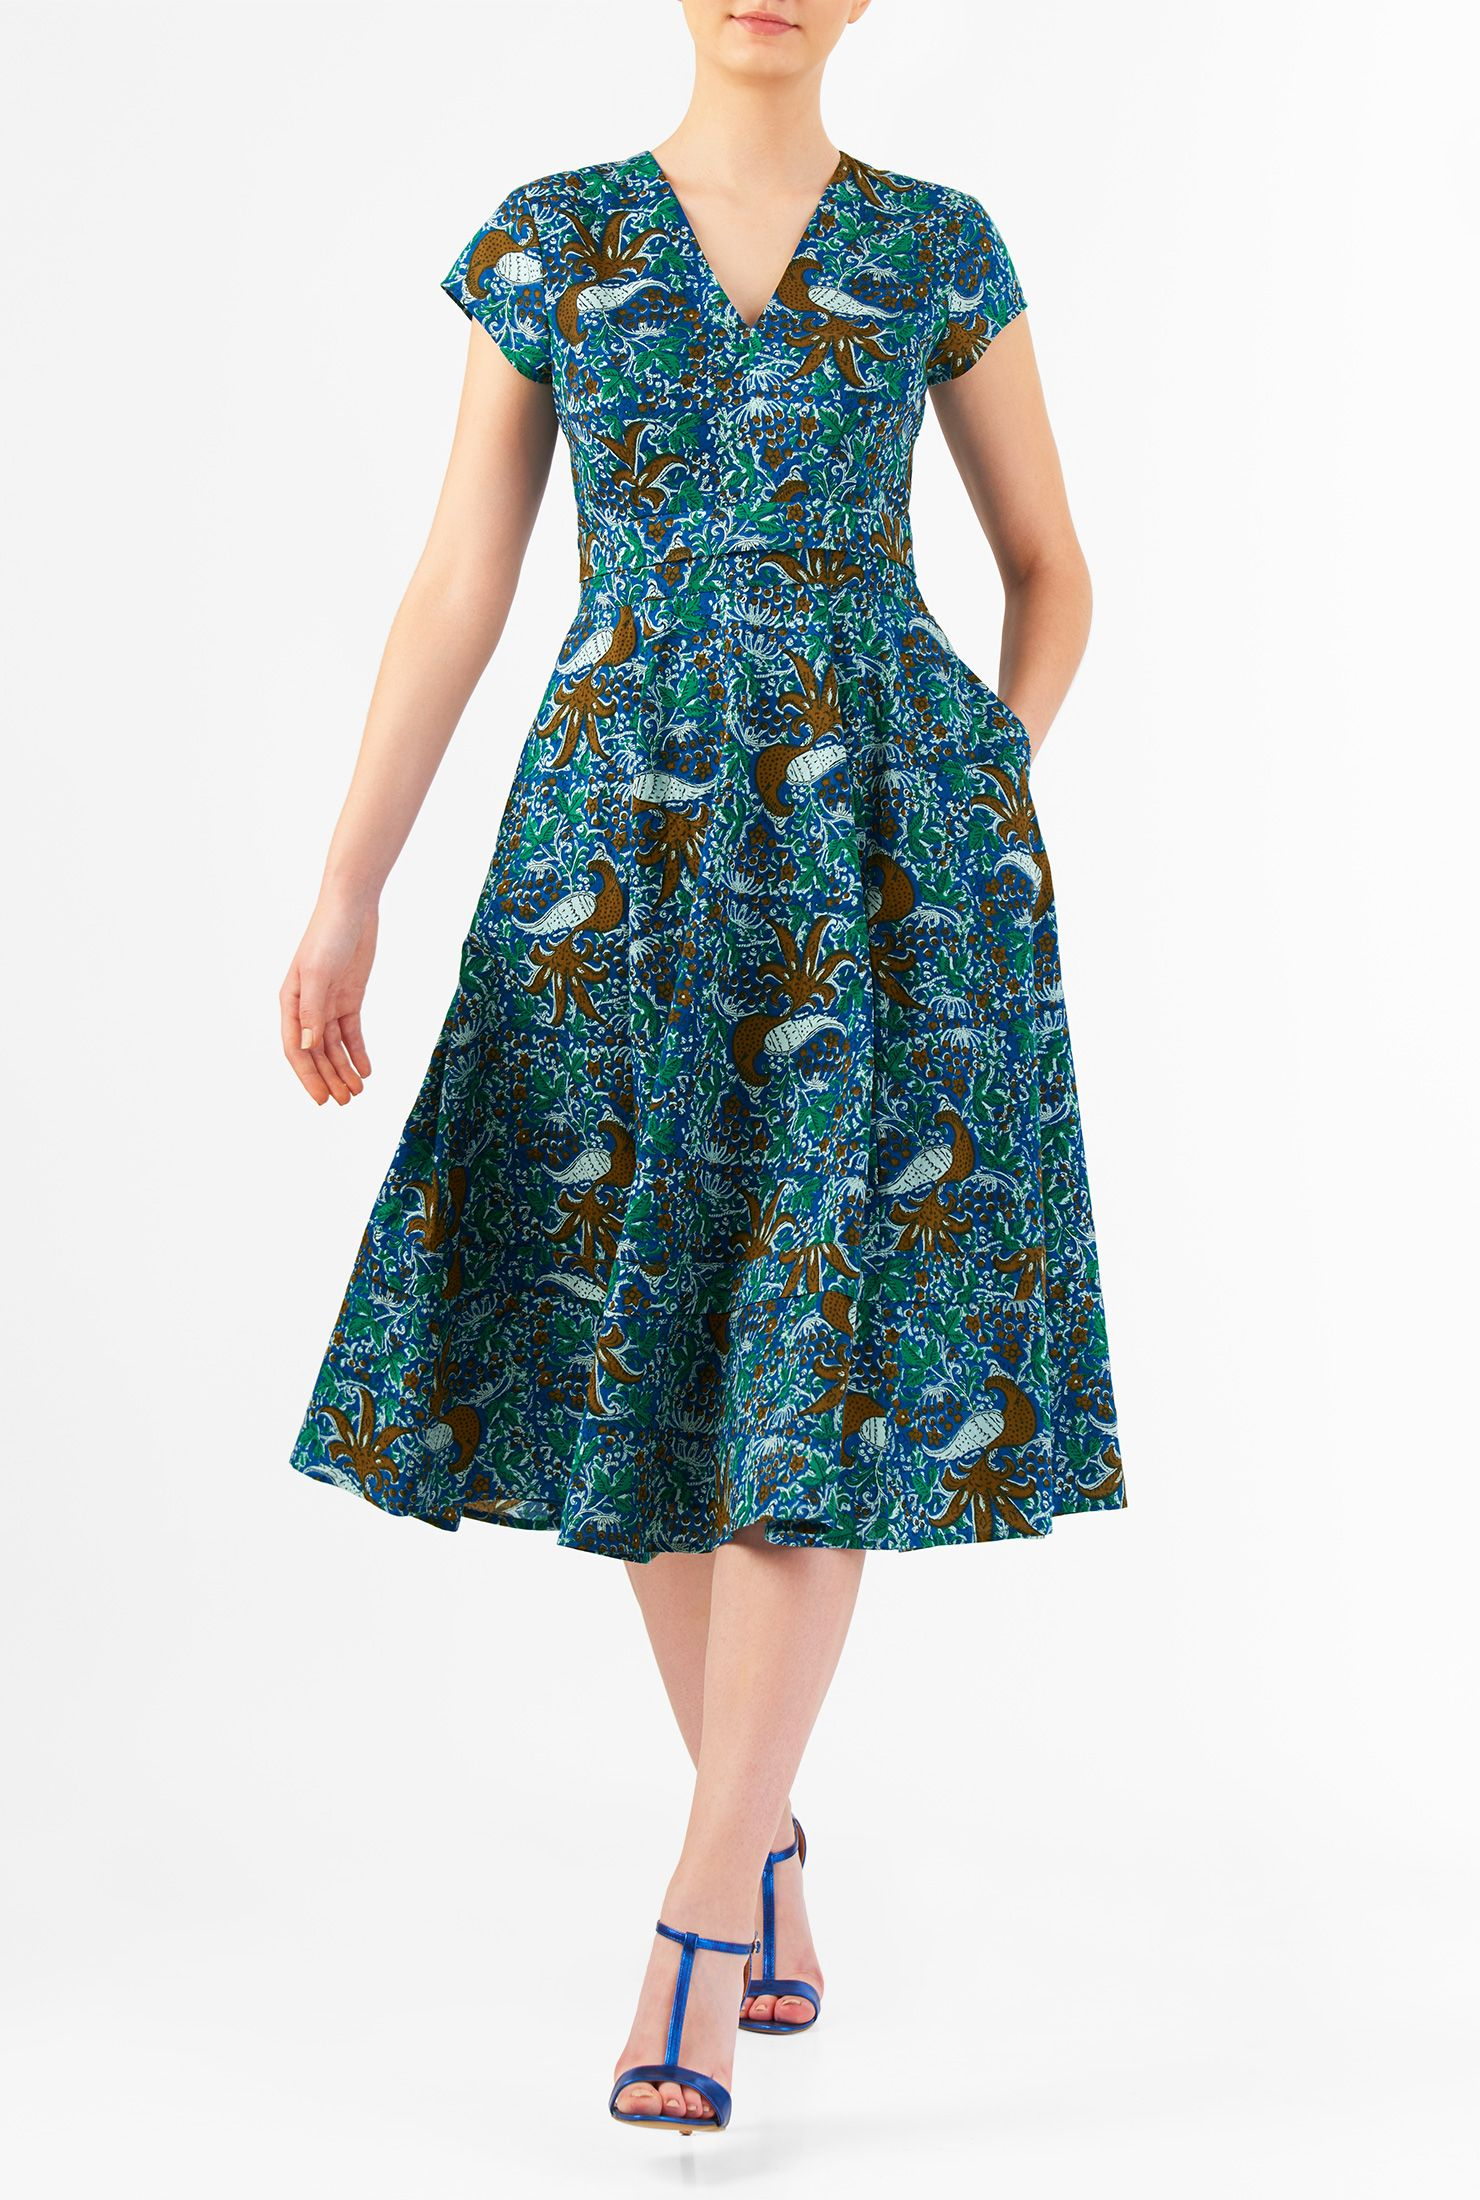 21463b900af Women's Fashion Clothing 0-36W and Custom   Fashion   Dresses ...